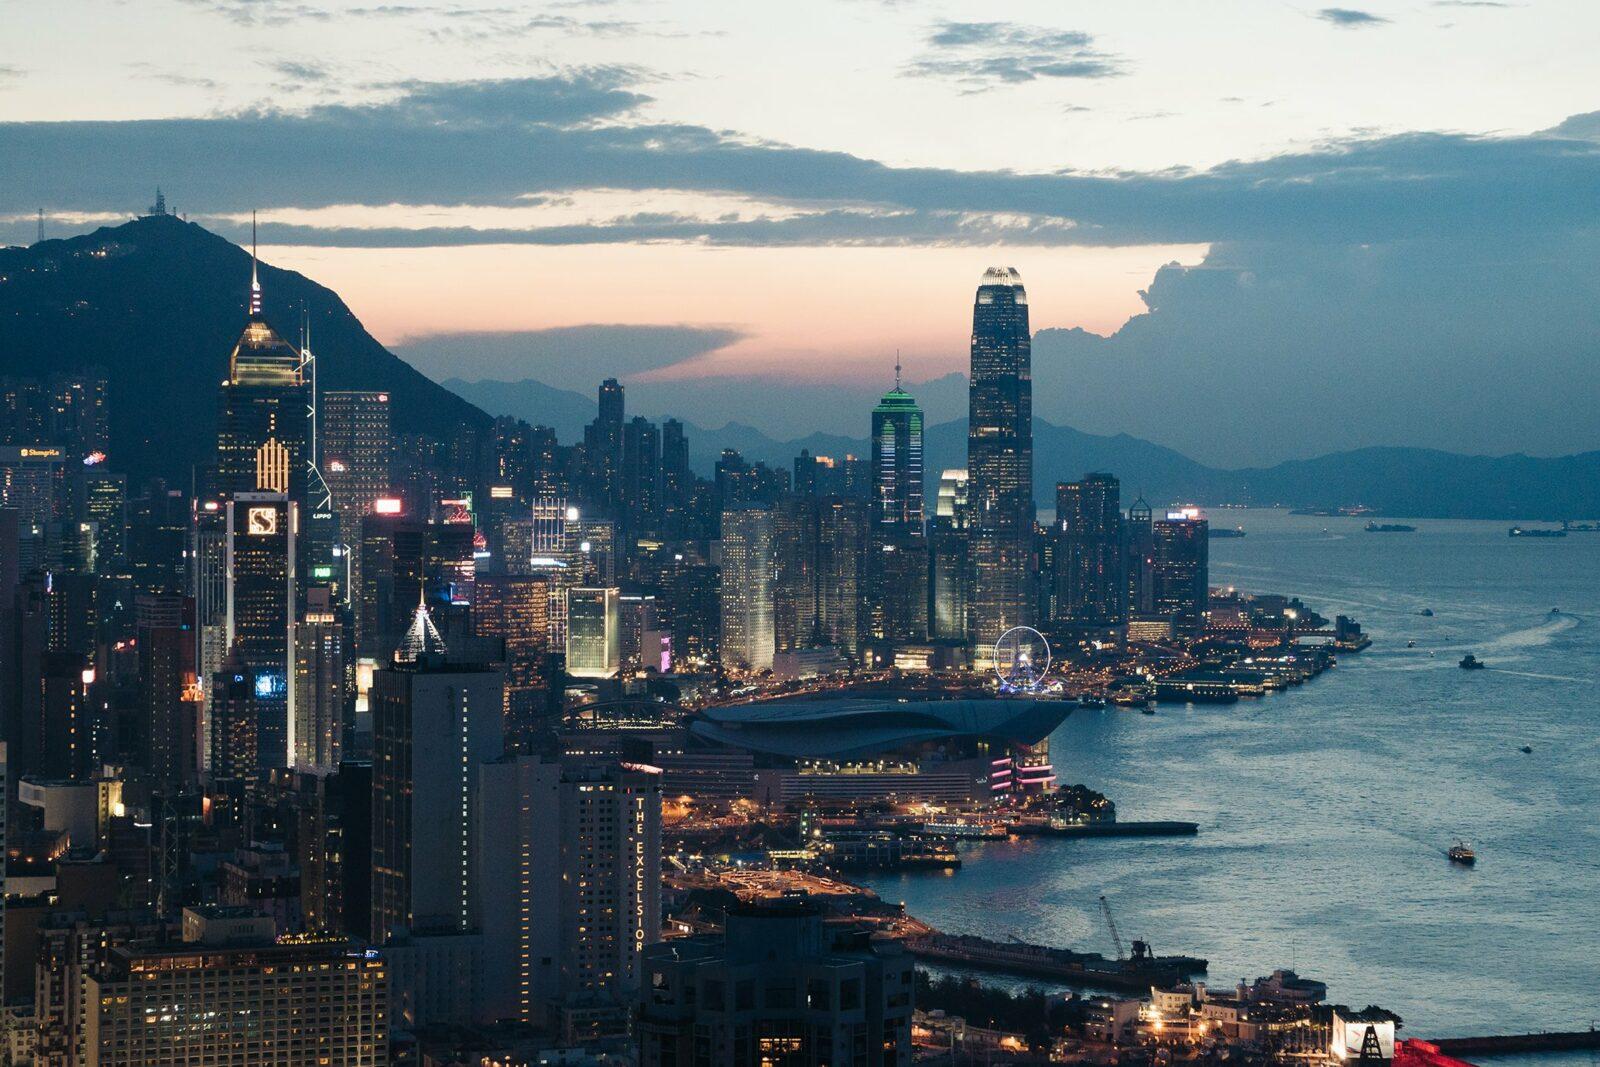 aerial view of the hong kong skyline at dusk